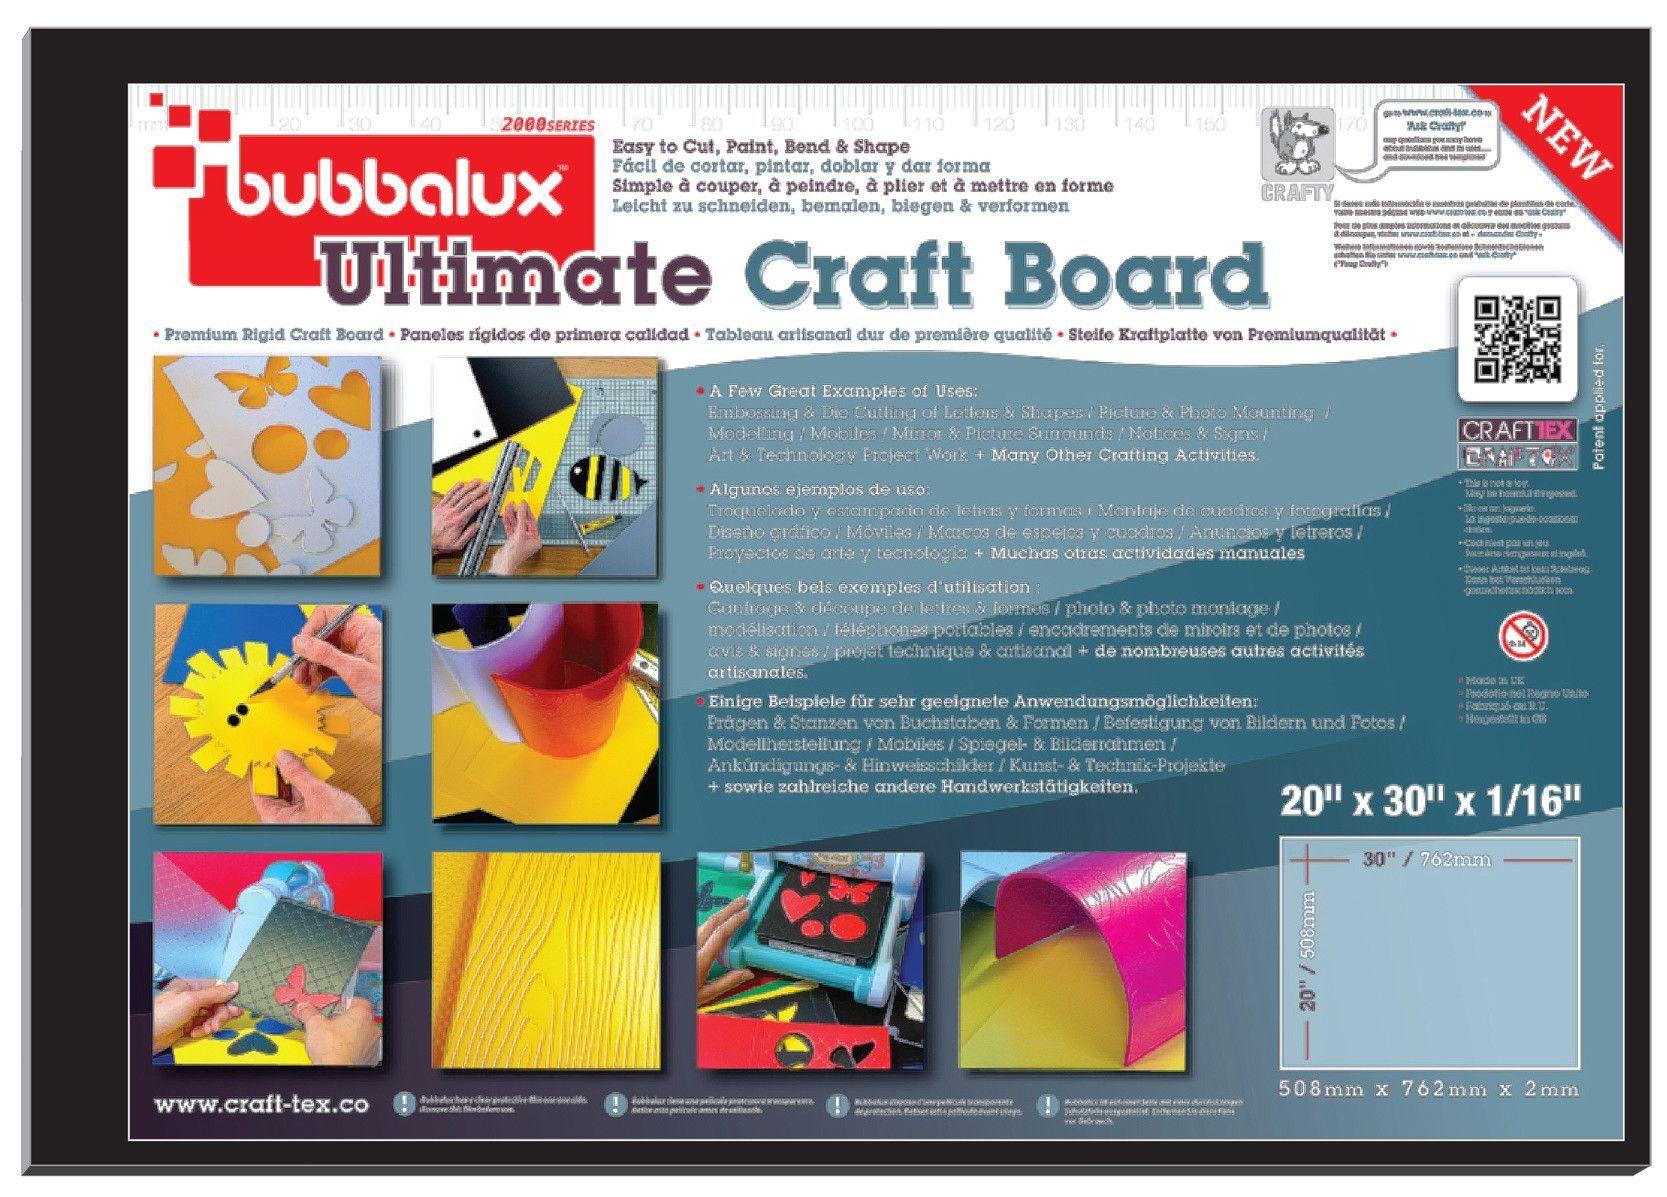 Craftex Bubbalux Ultimate Craft Board